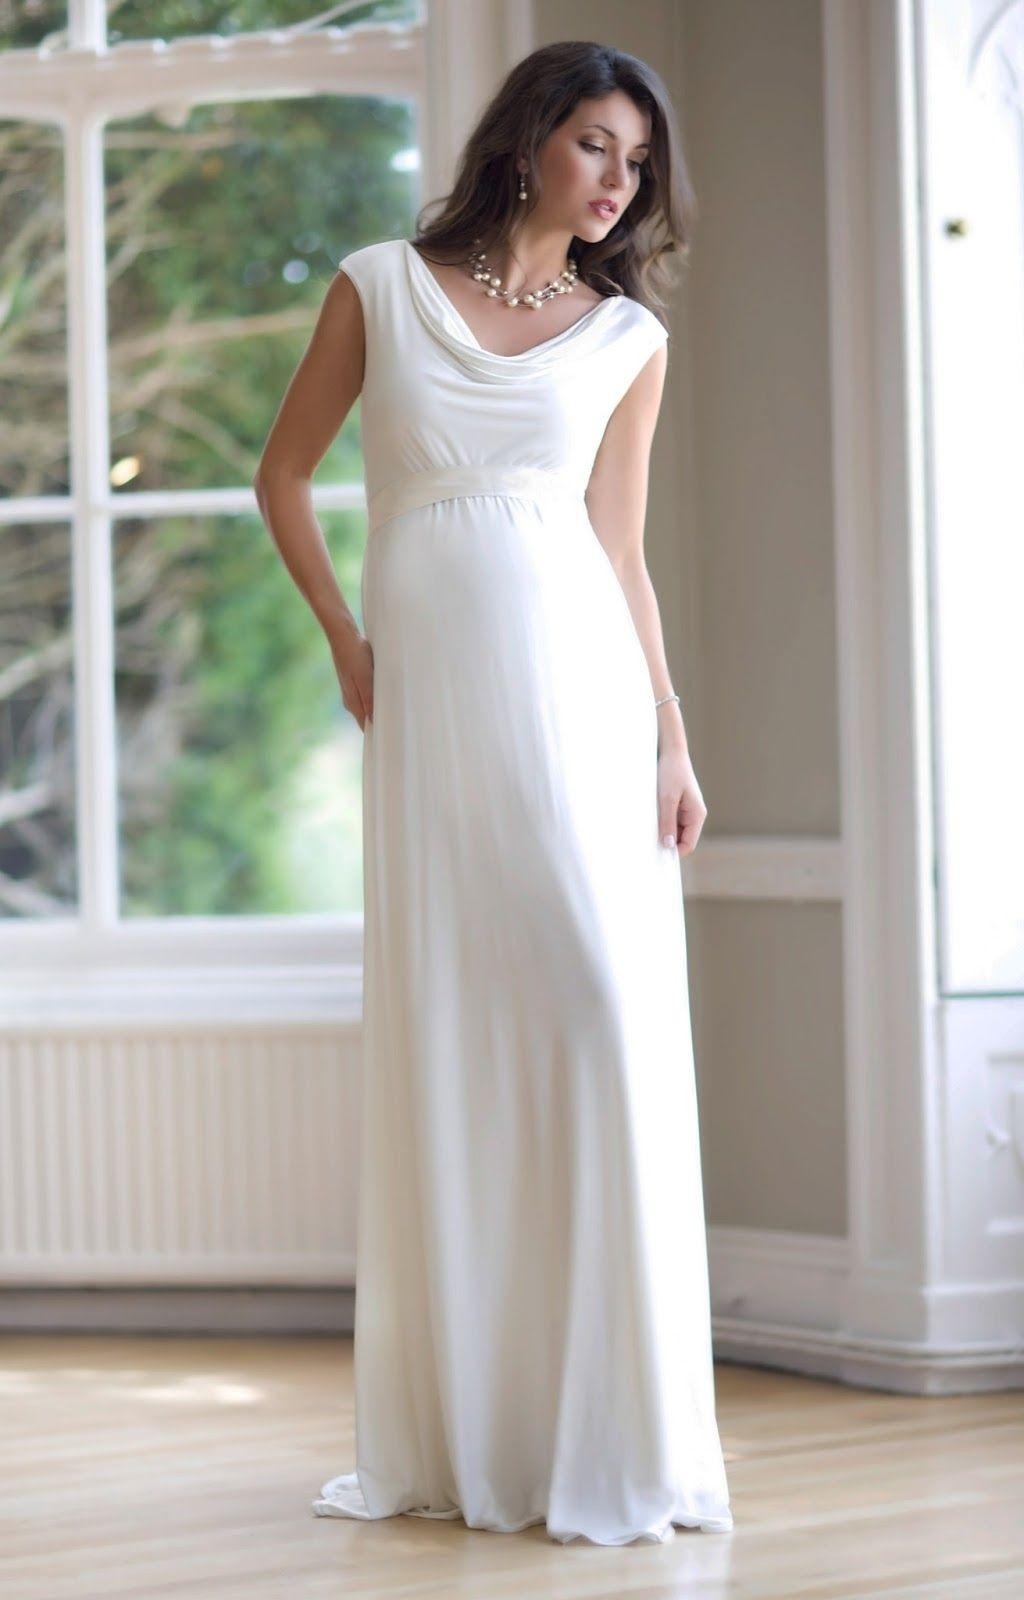 Simple Wedding Dresses For Brides Over 50 | Wedding Dress ...